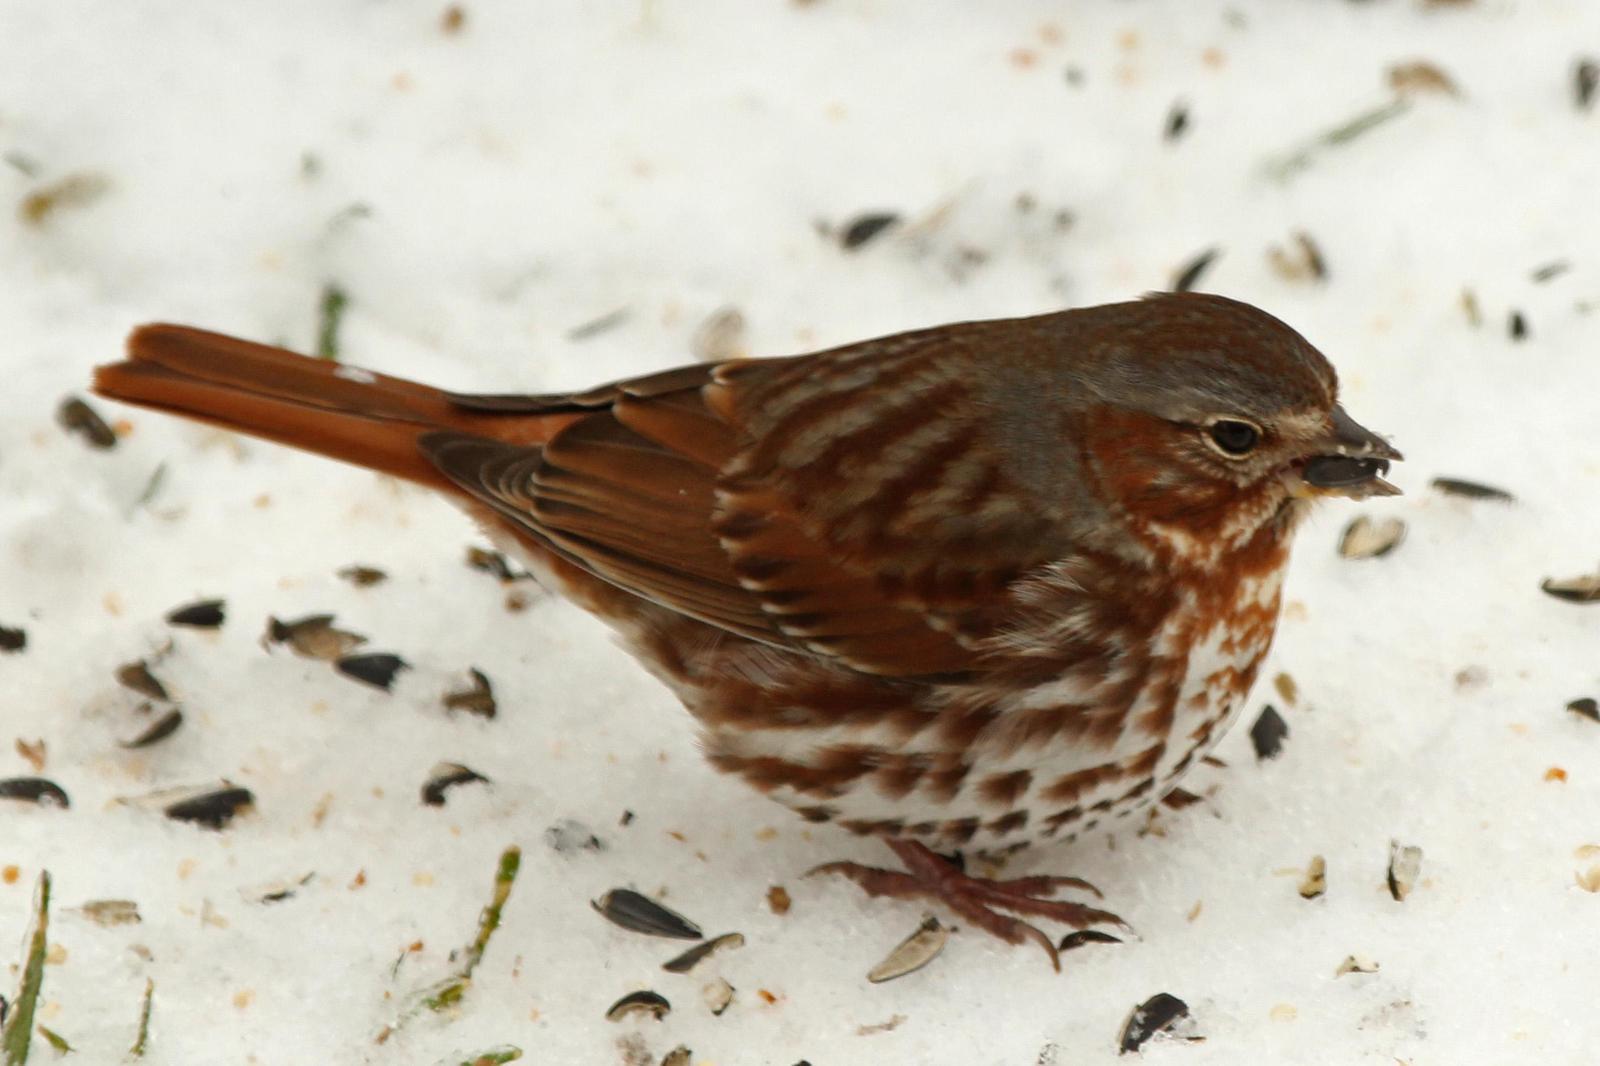 Fox Sparrow Photo by Kristy Baker